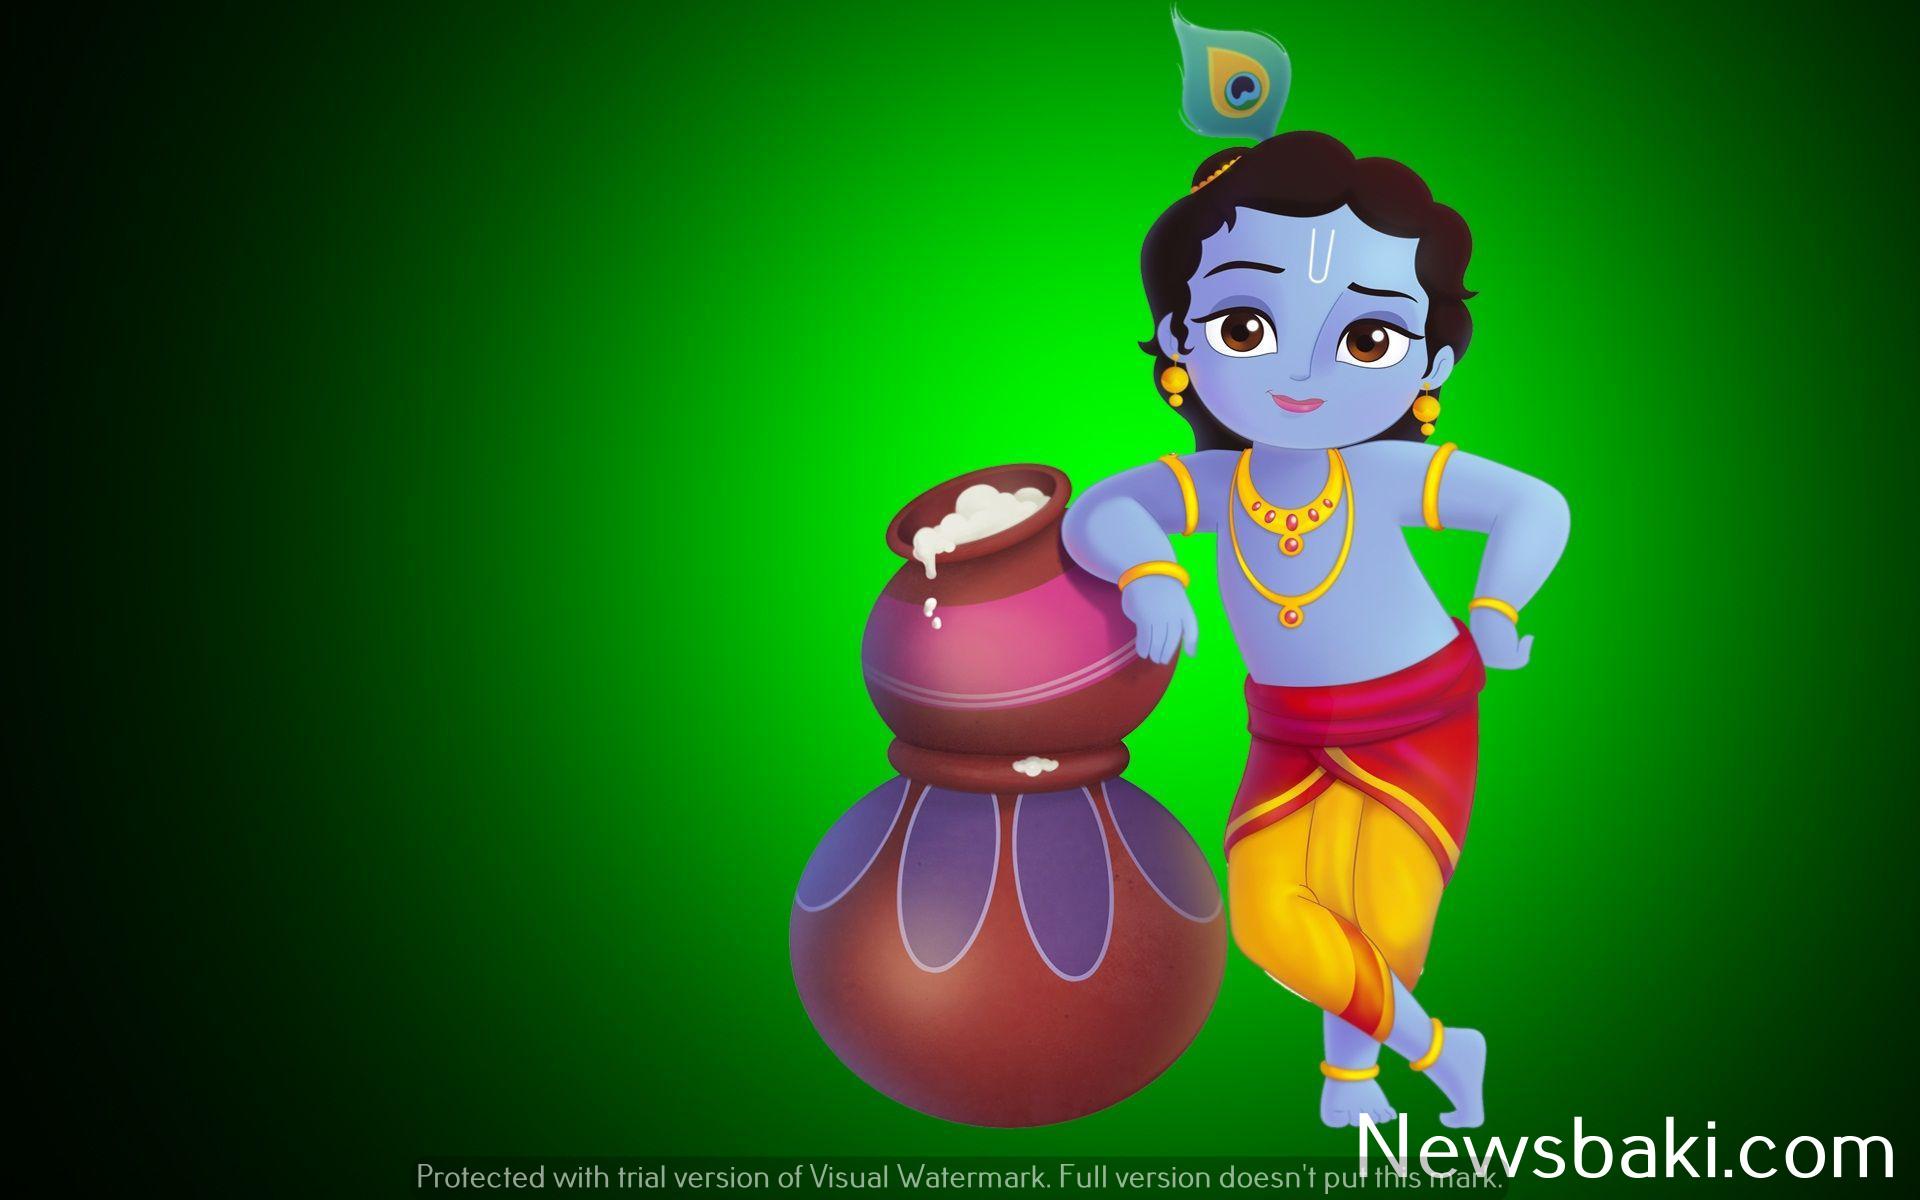 little krishna images for whatsapp dp 1